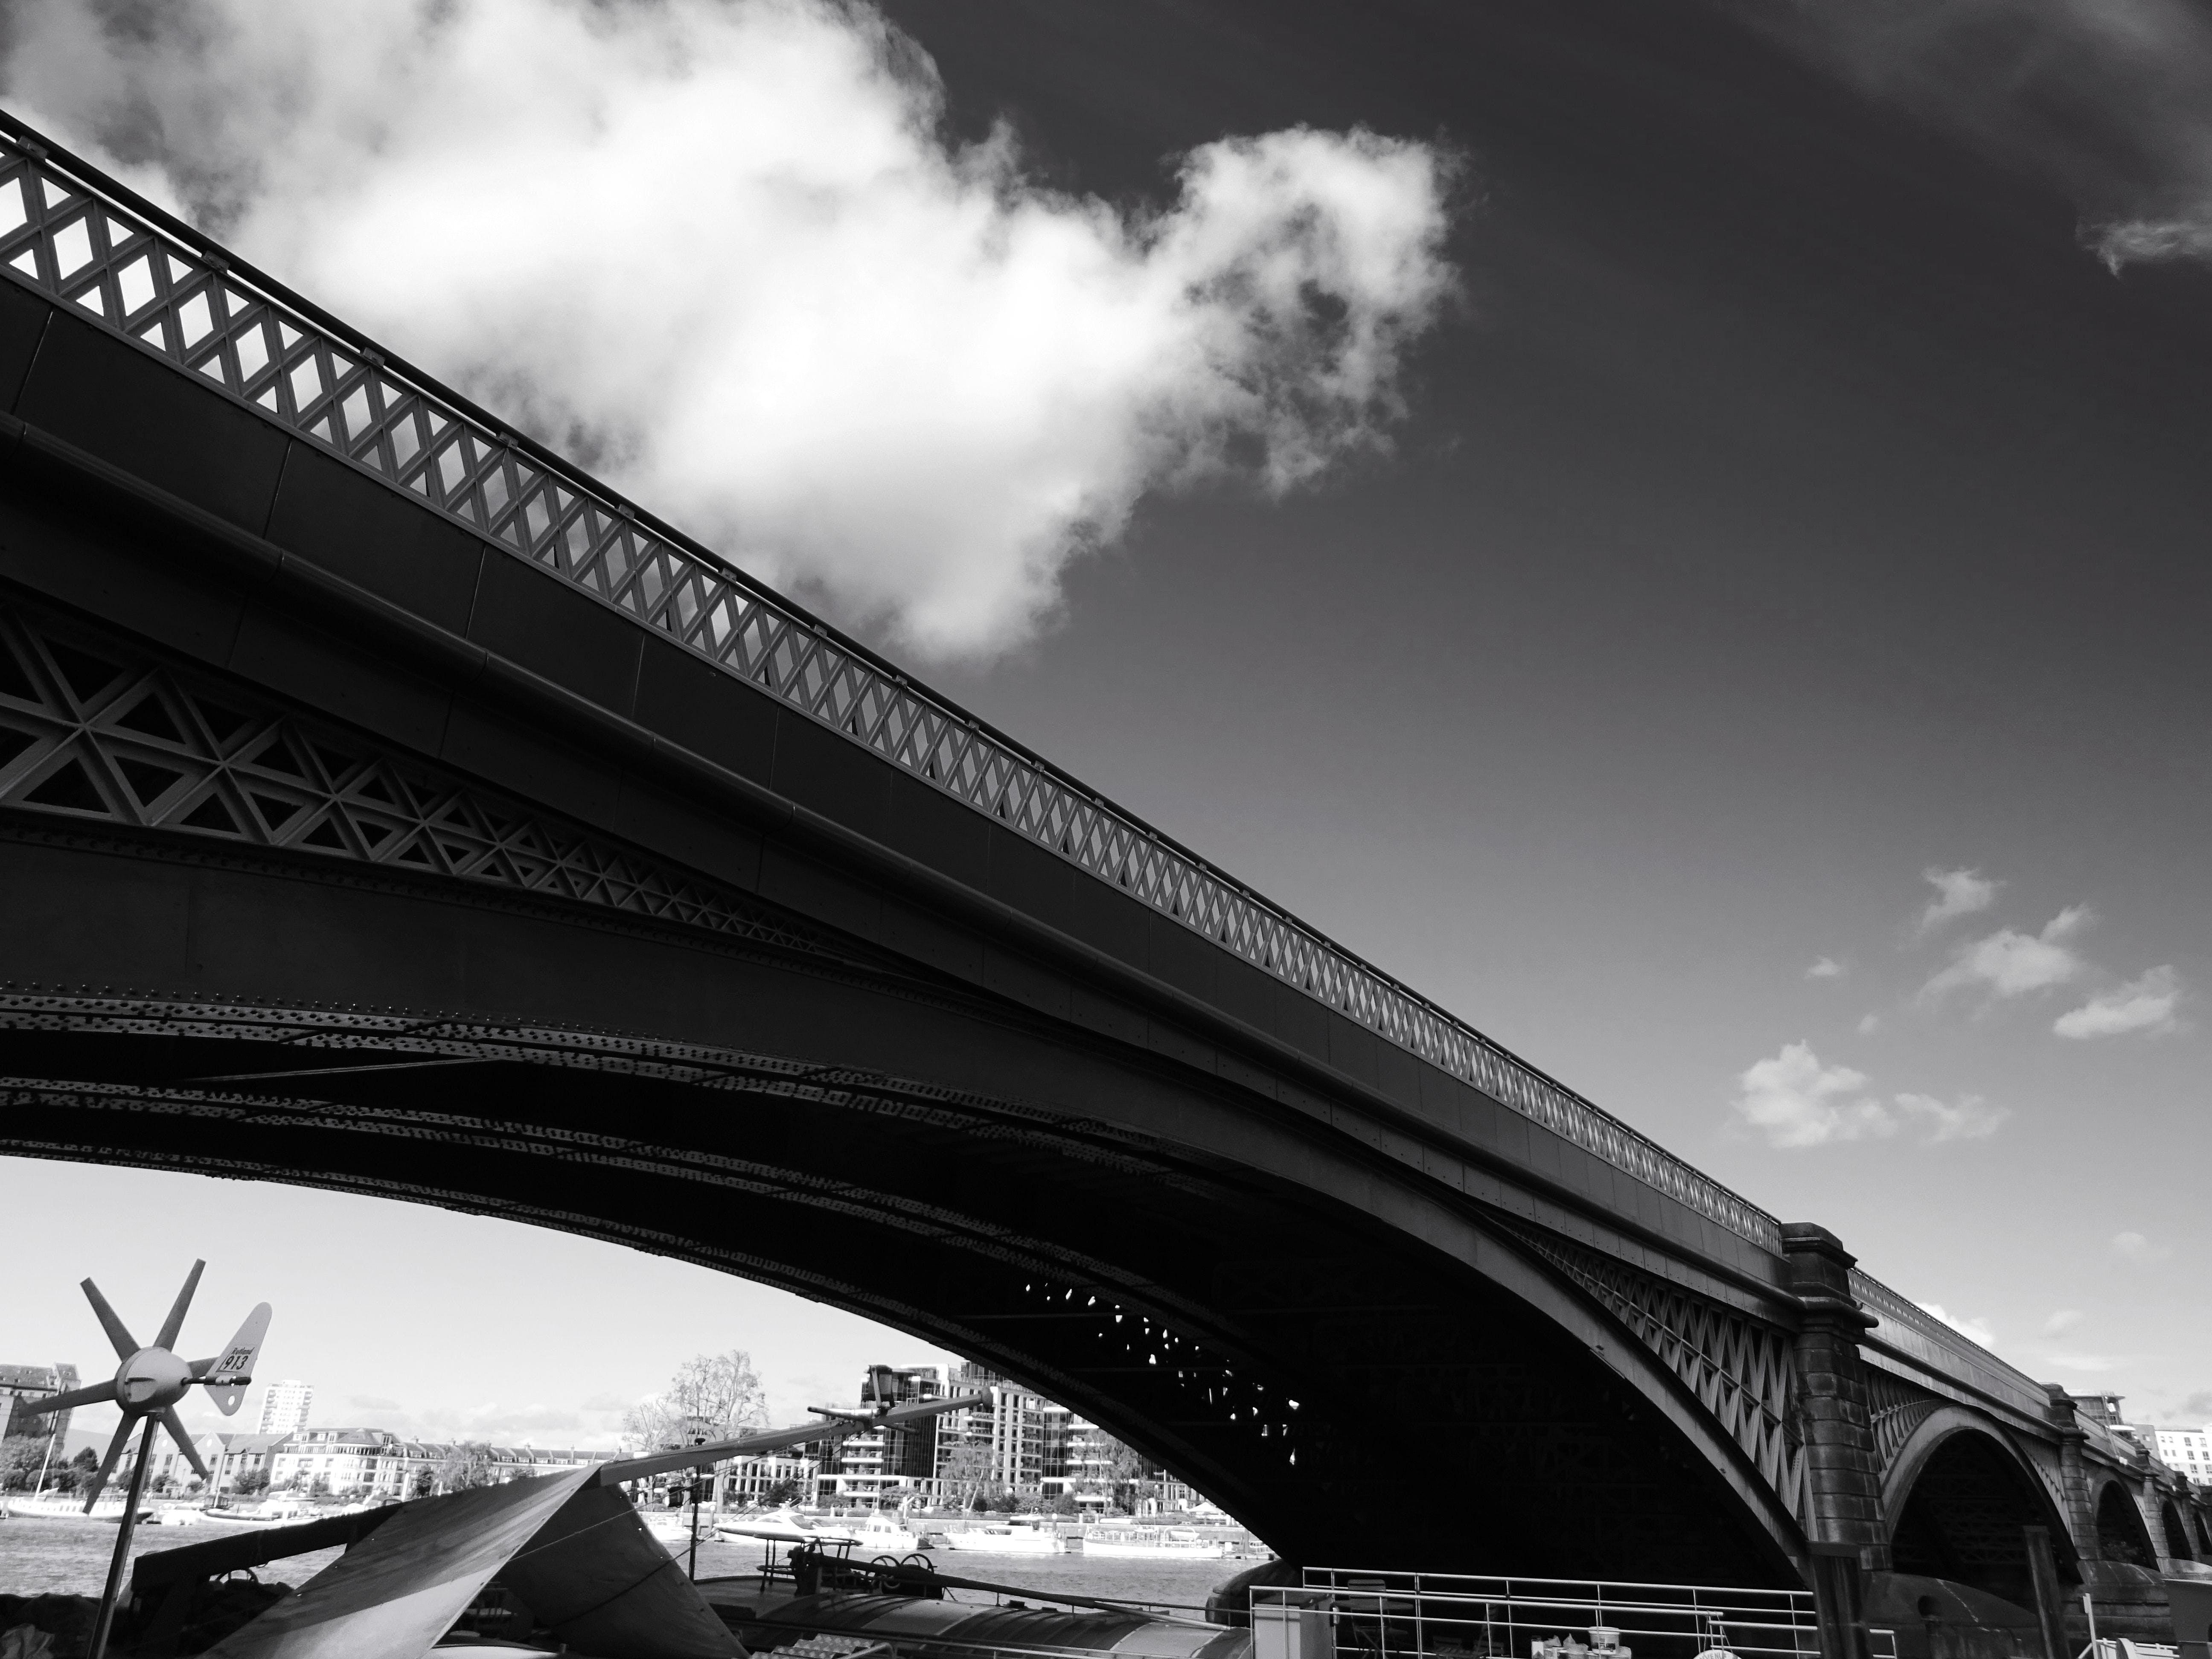 Grayscale of Bridge